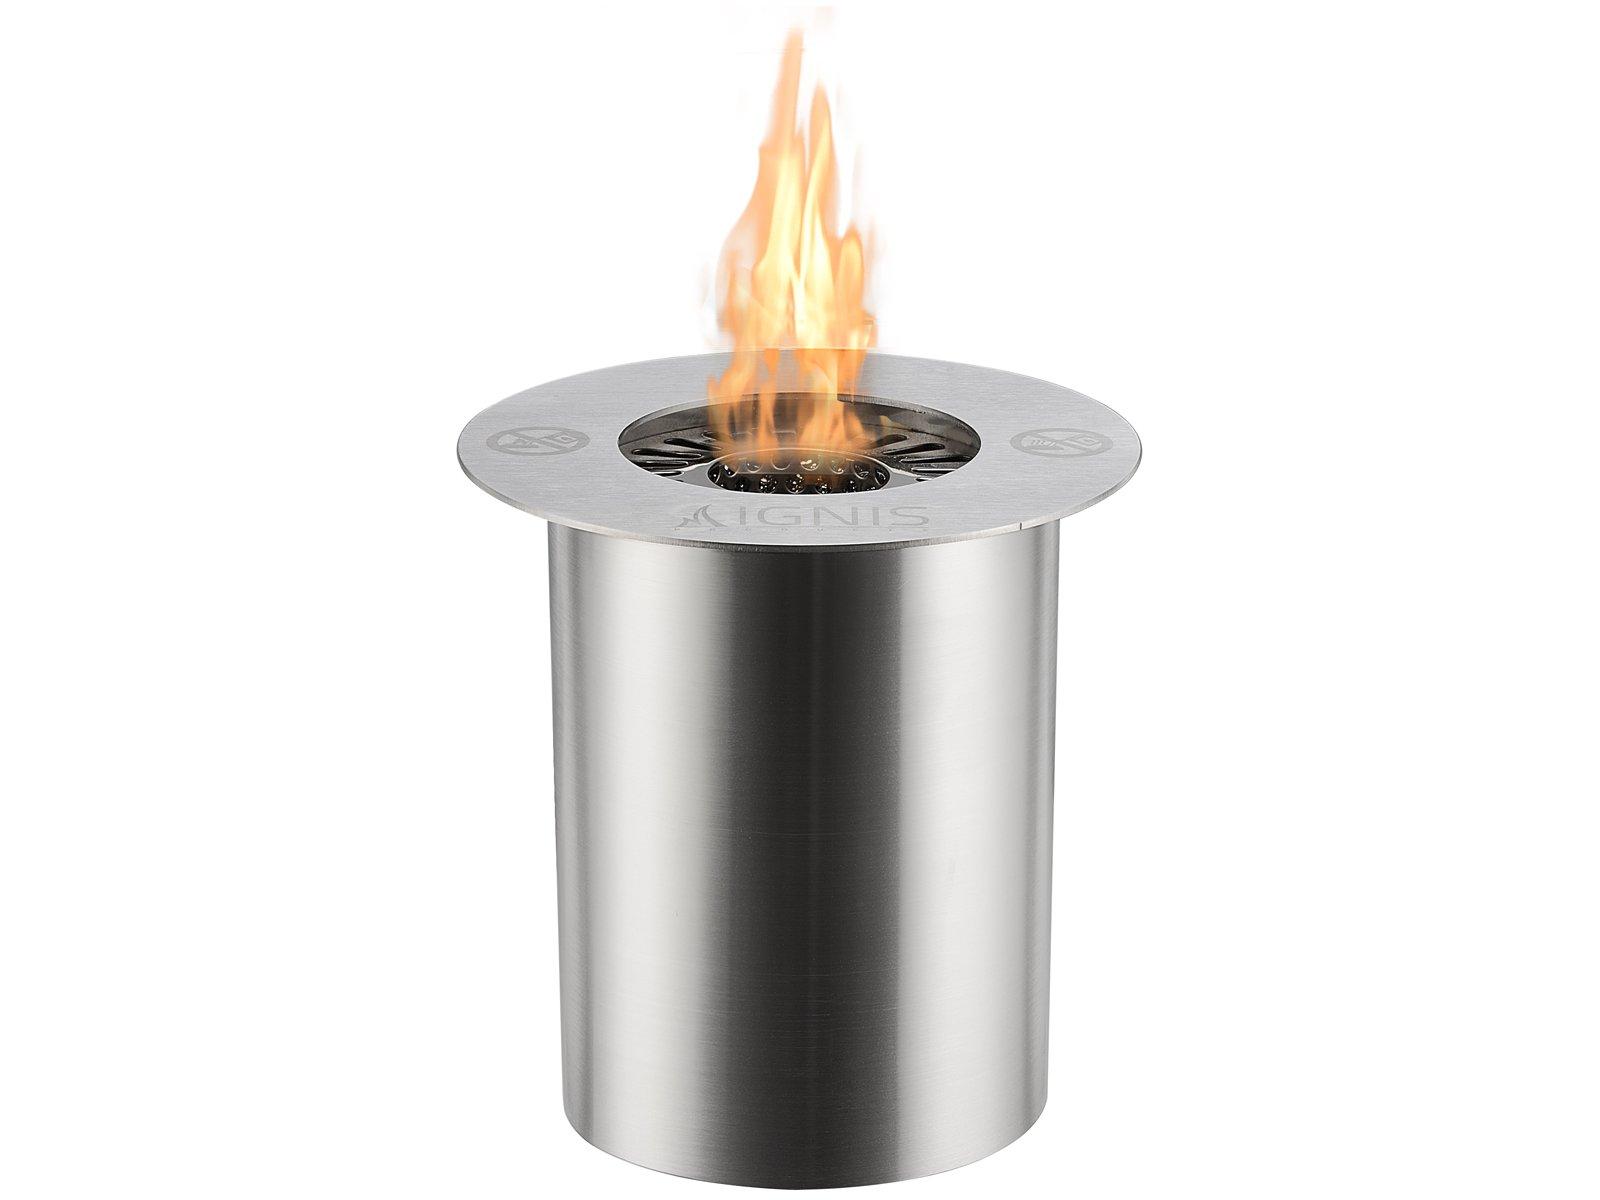 EB150 - Ethanol Fireplace Burner Insert